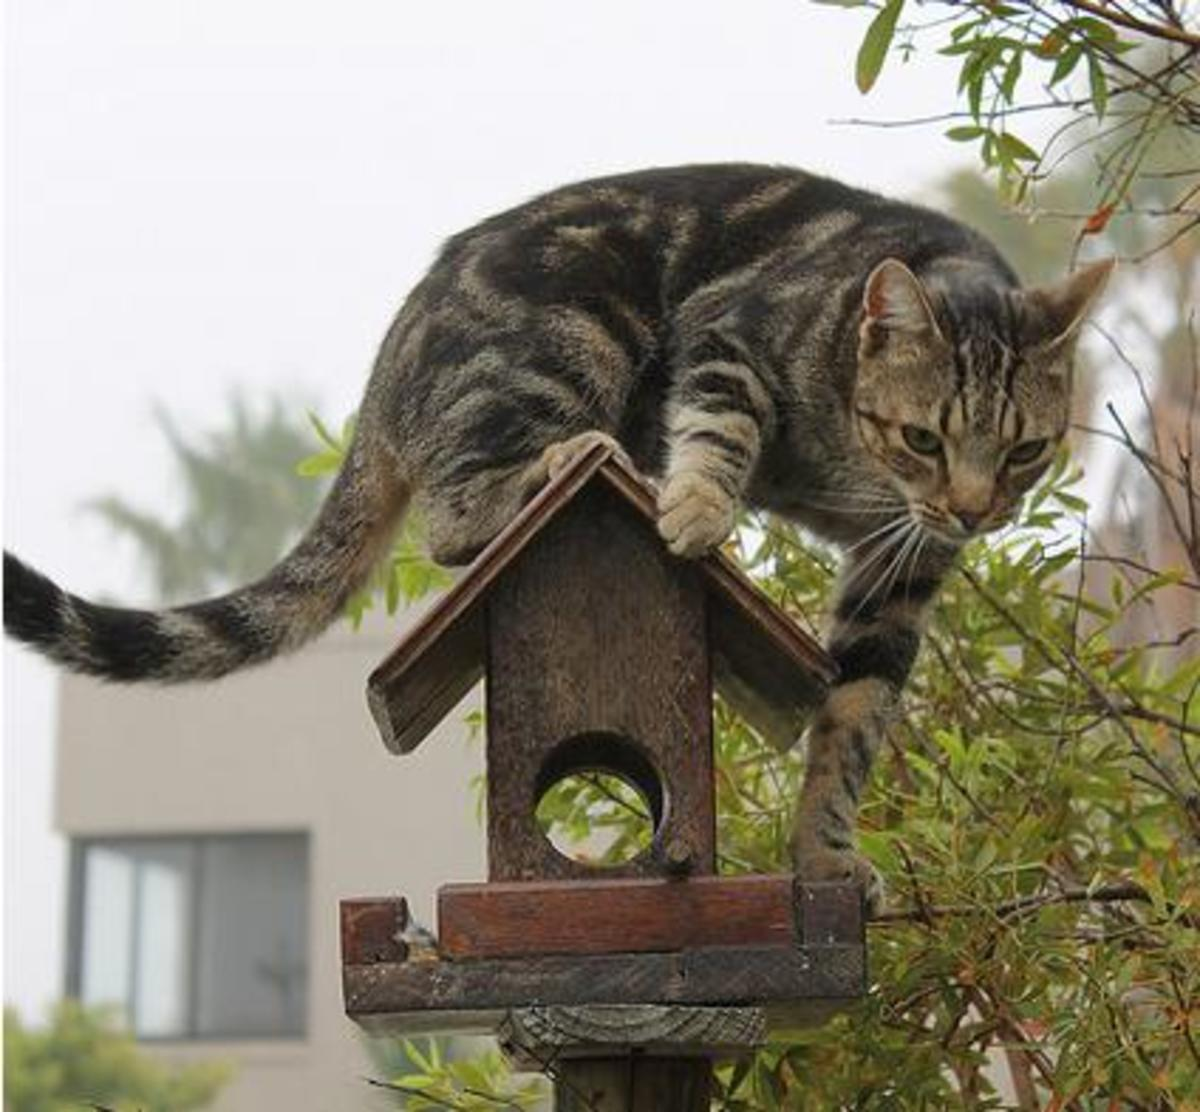 Owned pet cats often raid people's bird feeders